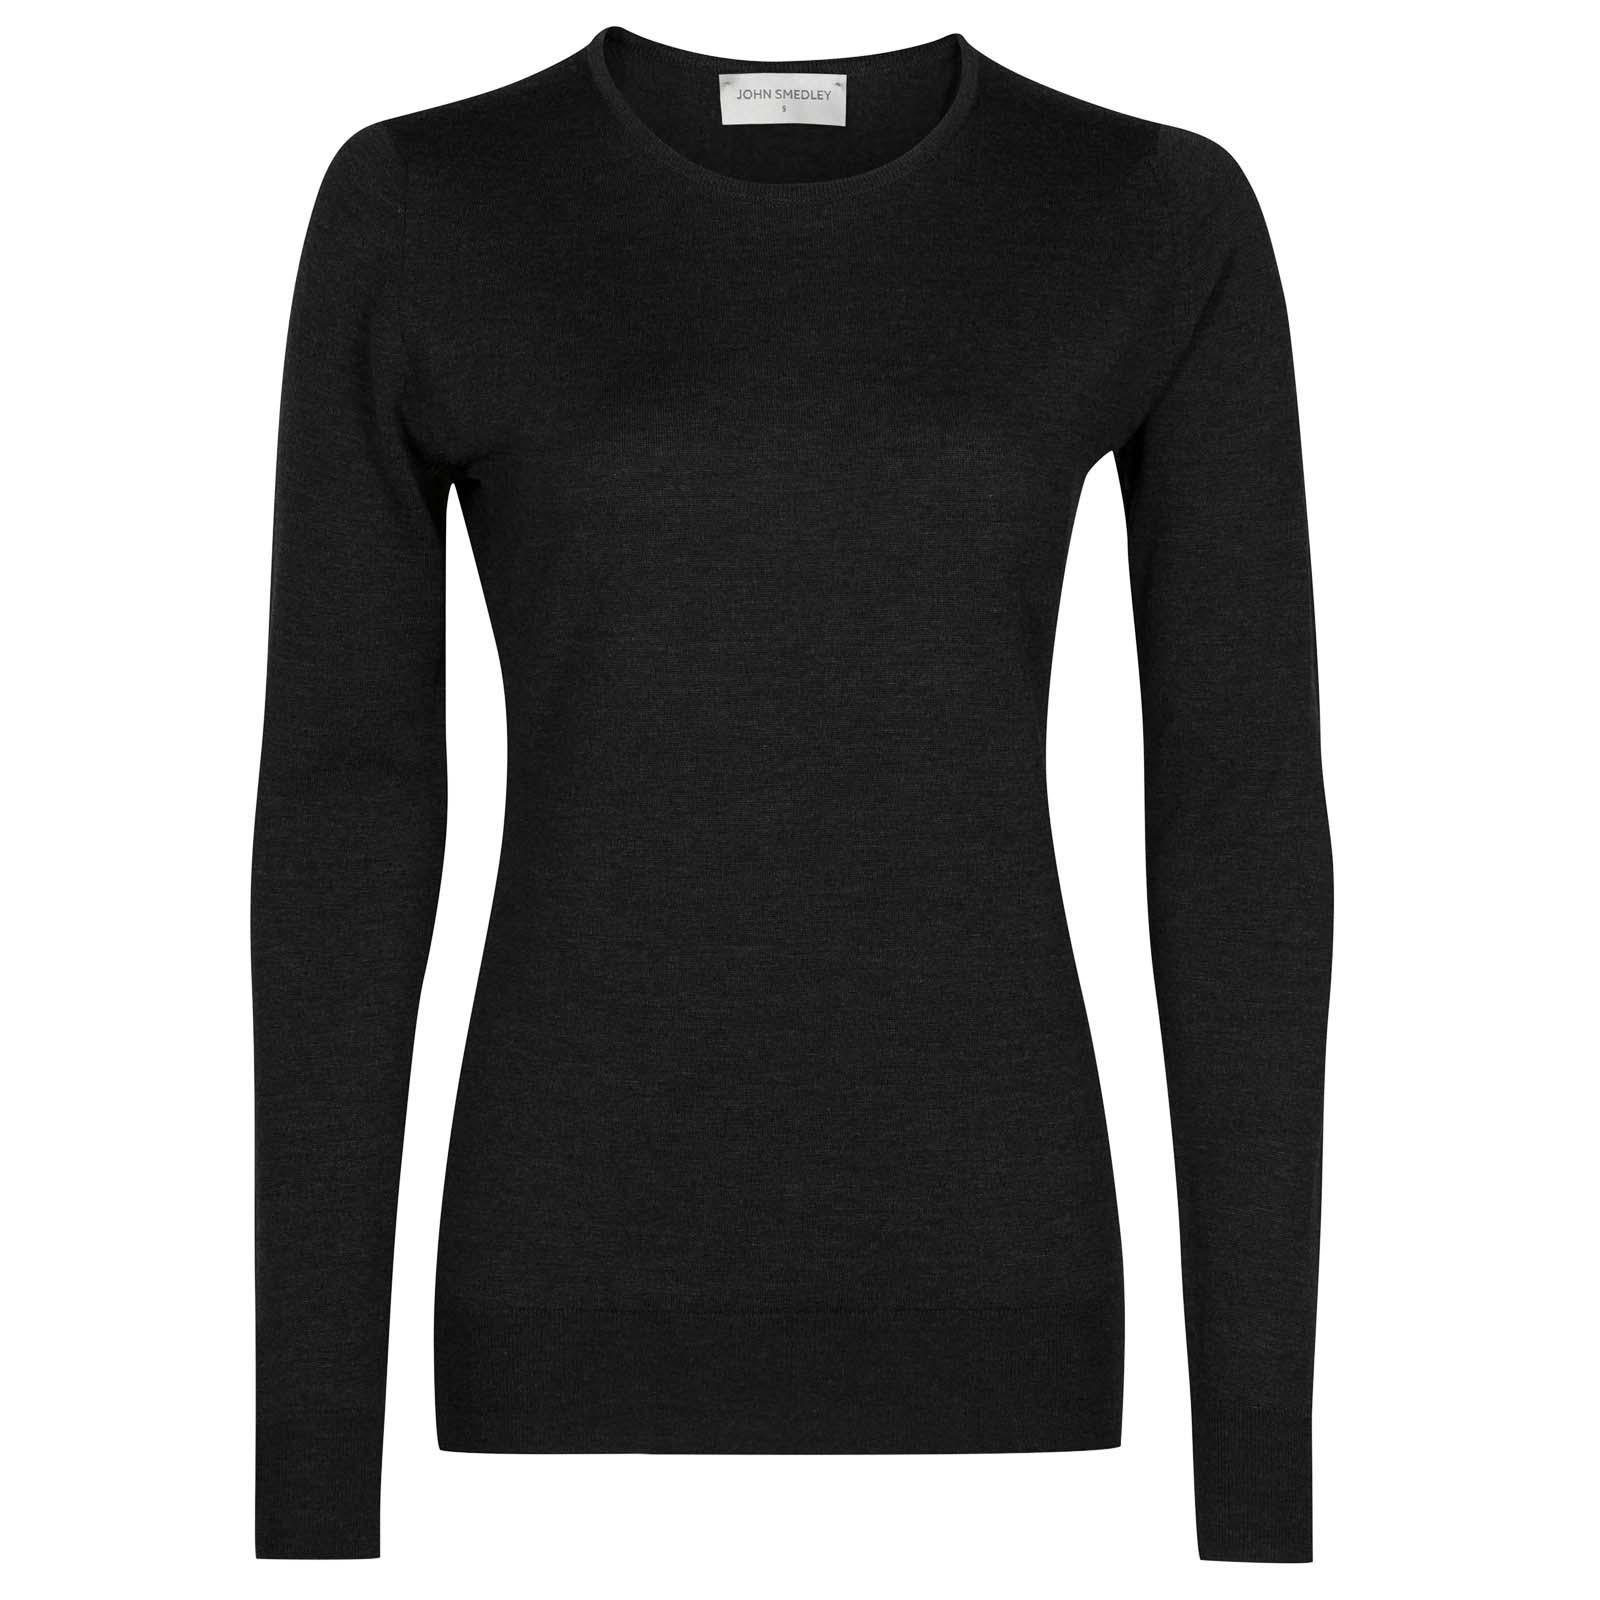 John Smedley geranium Merino Wool Sweater in Hepburn Smoke-L